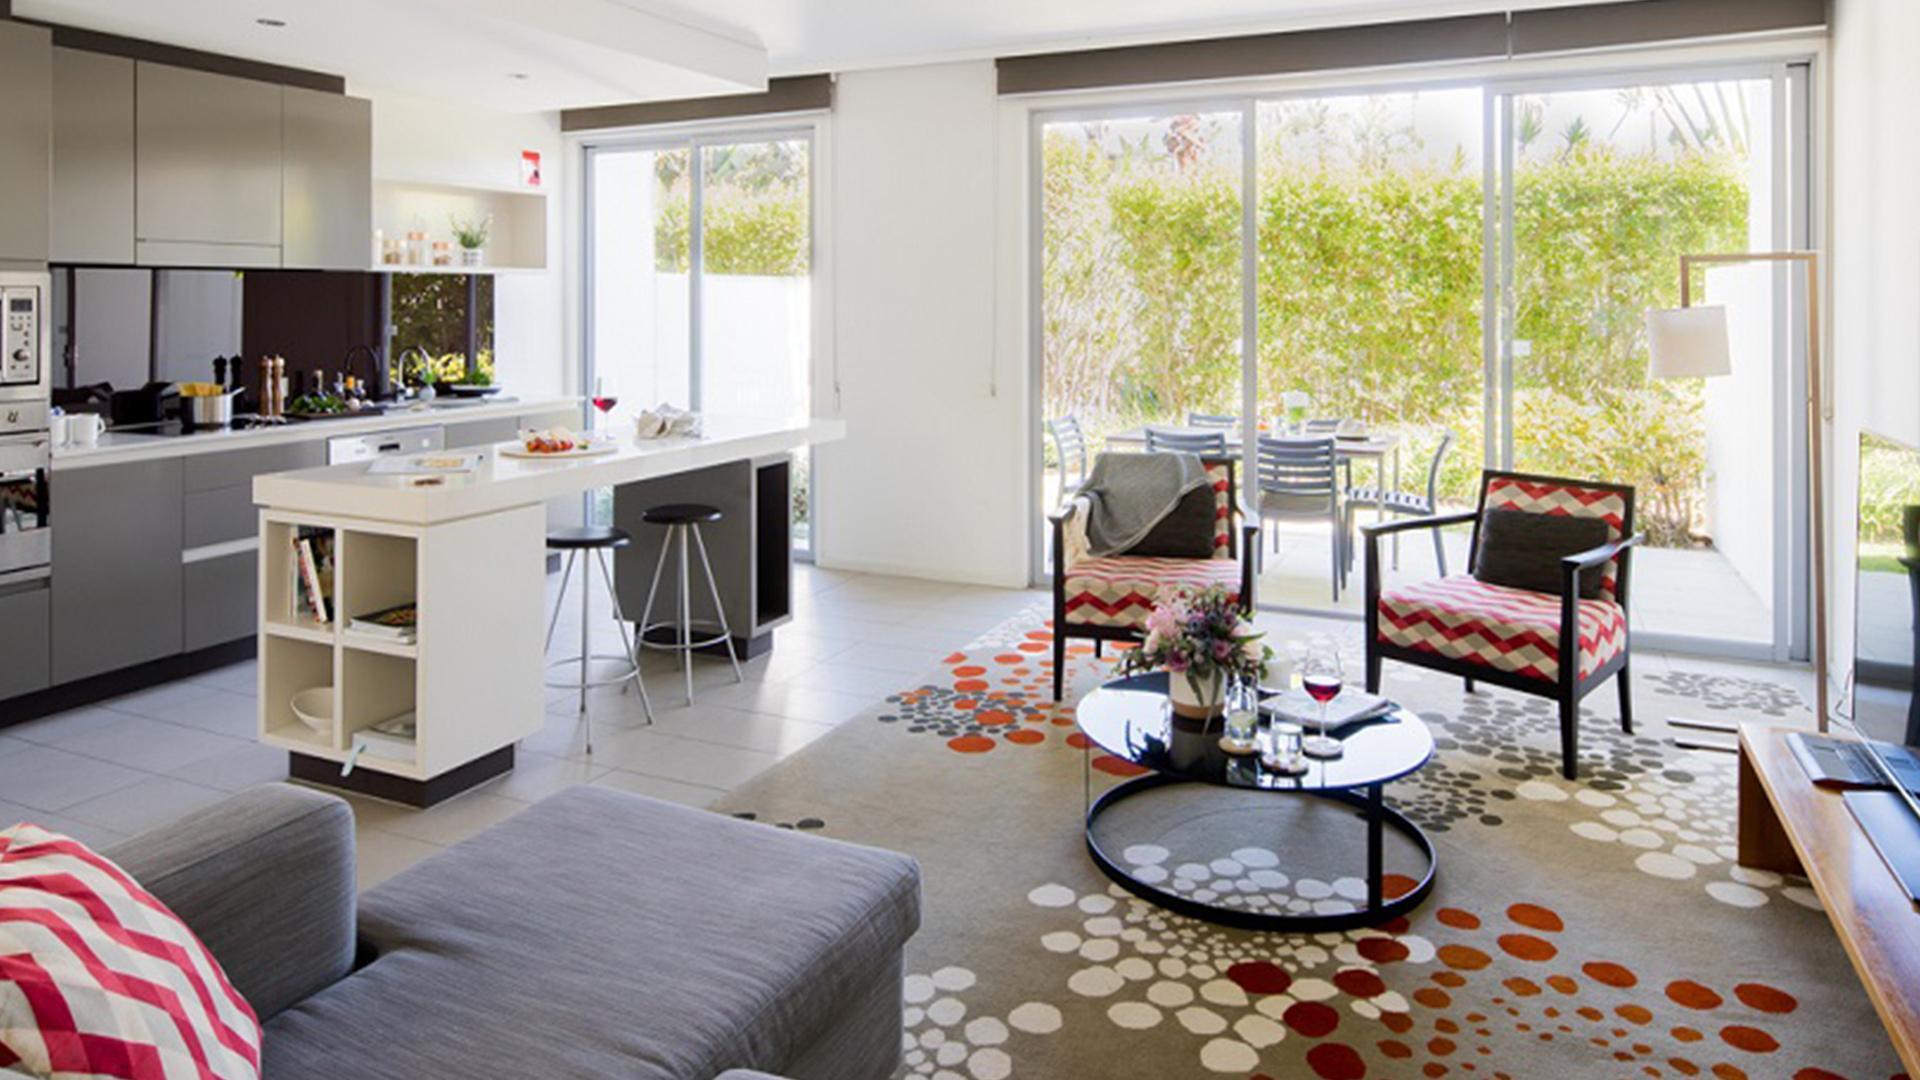 Three-Bedroom Apartment image 1 at Pullman Magenta Shores Resort by Wyong Shire Council, New South Wales, Australia